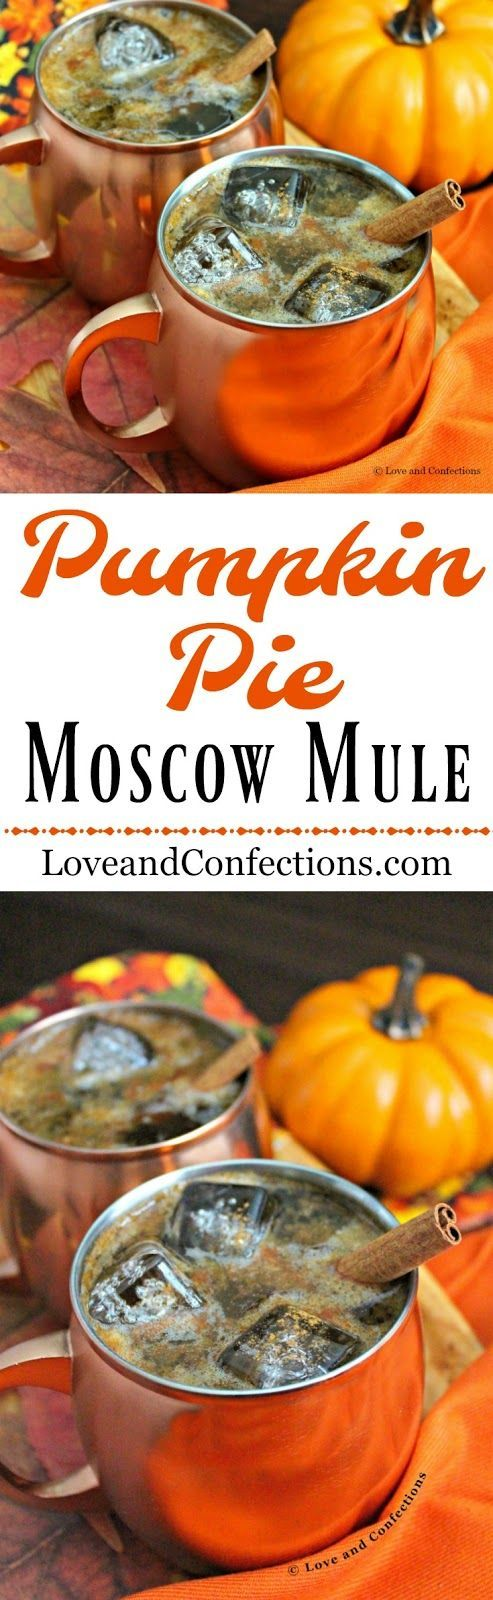 Pumpkin Pie Moscow Mule from LoveandConfections.com #PumpkinWeek